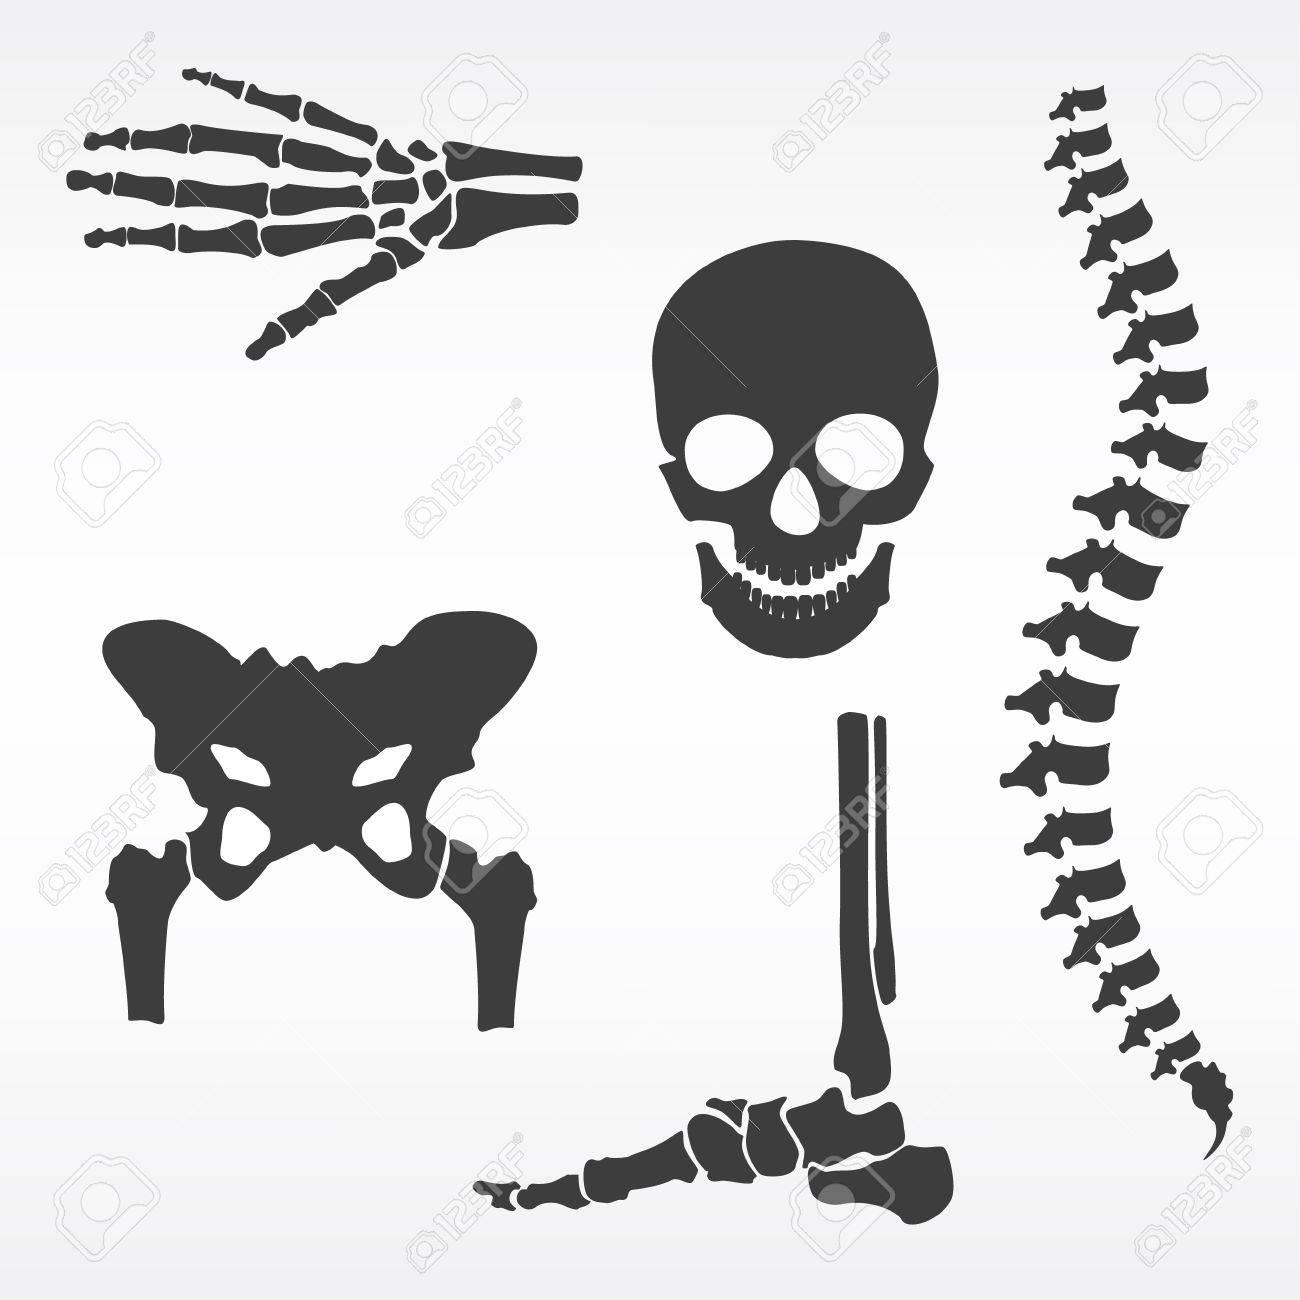 Raster Illustration Parts Of Human Skeleton. Human Joints Raster ...